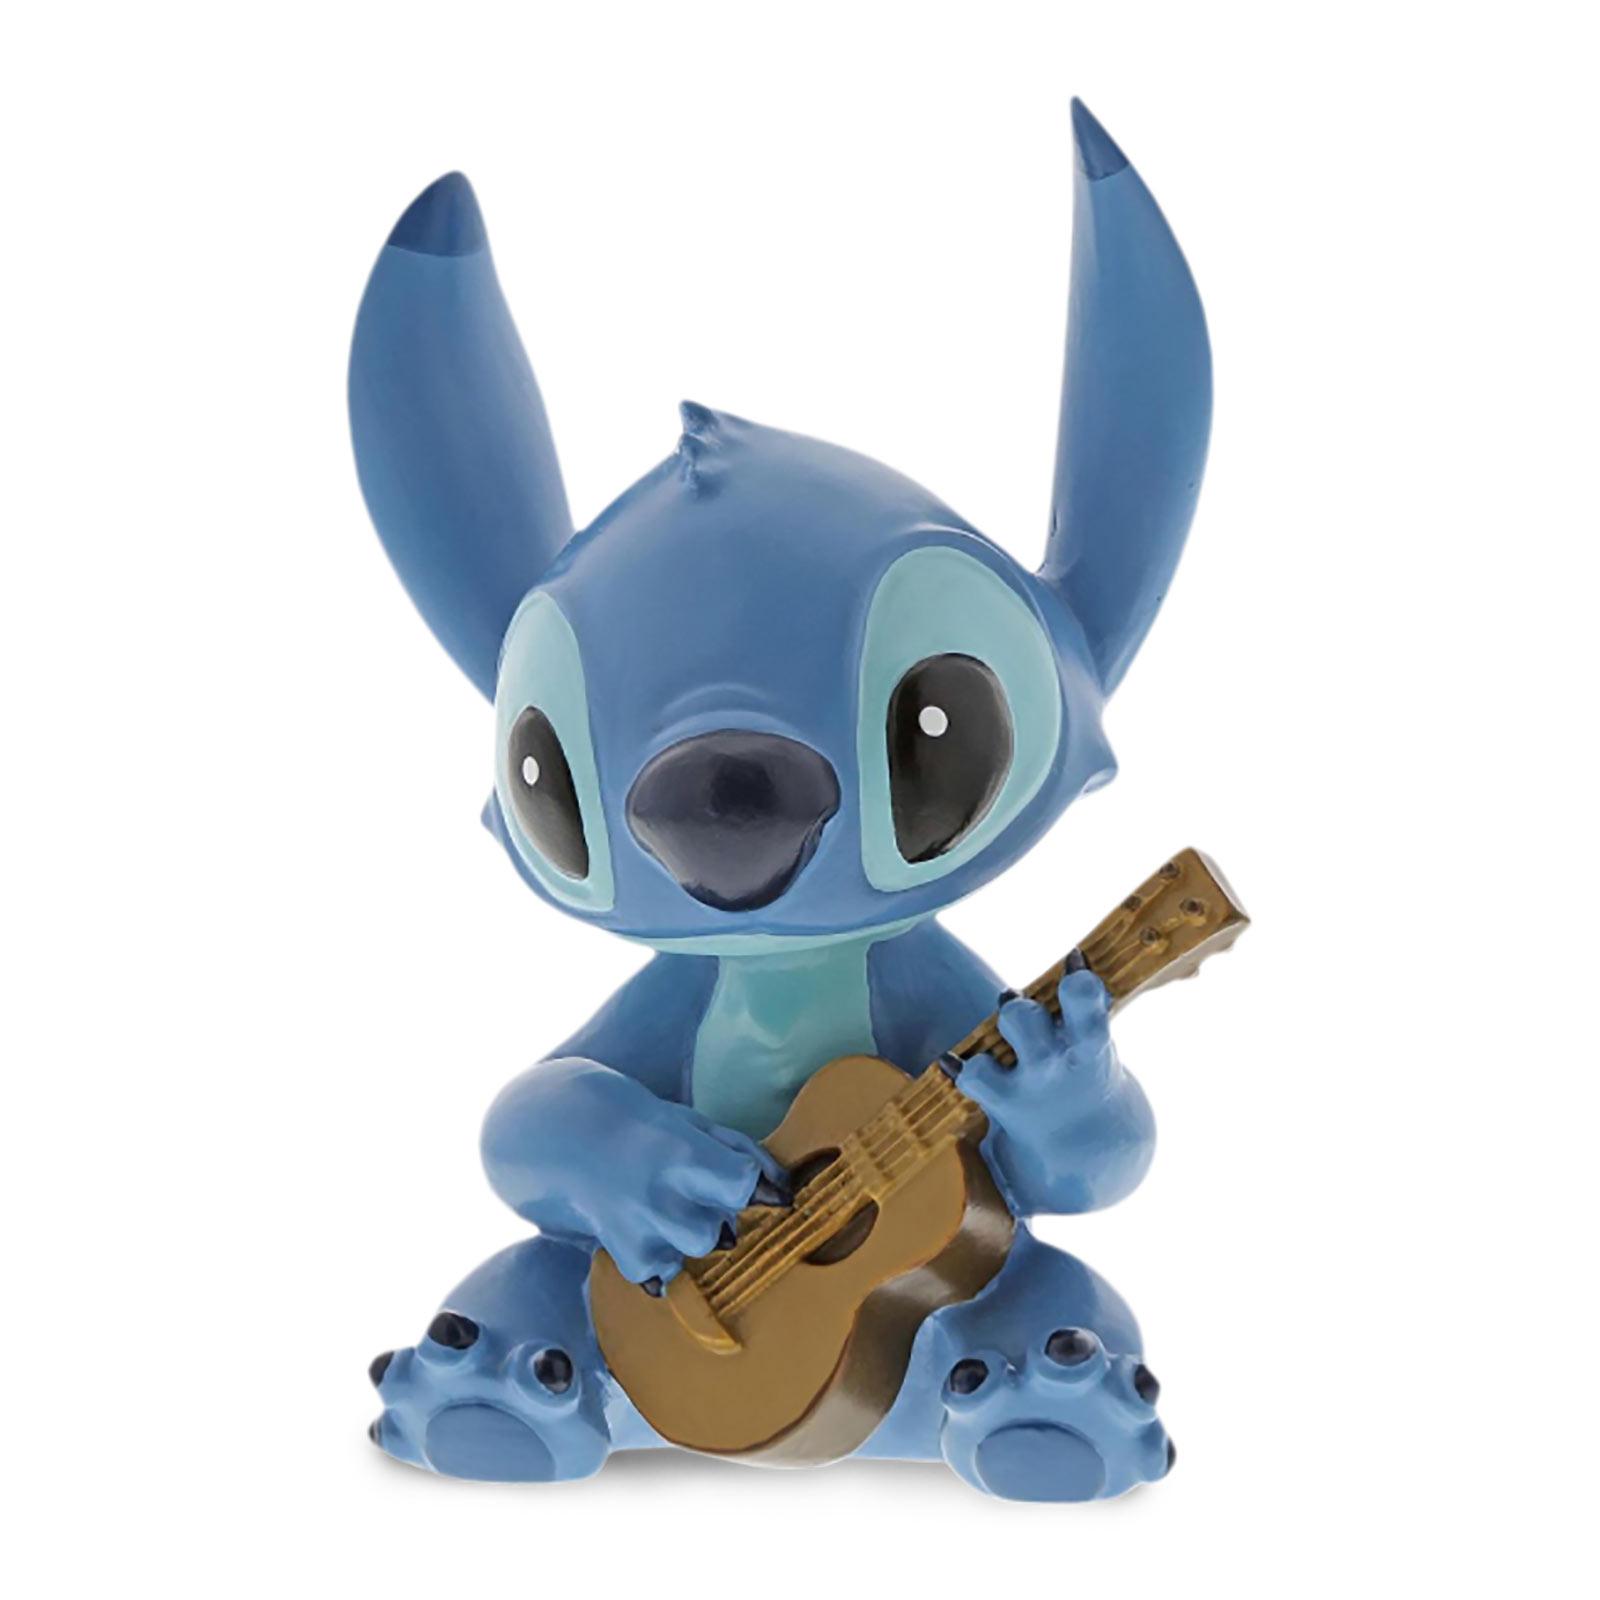 Lilo & Stitch - Stitch Figur mit Gitarre